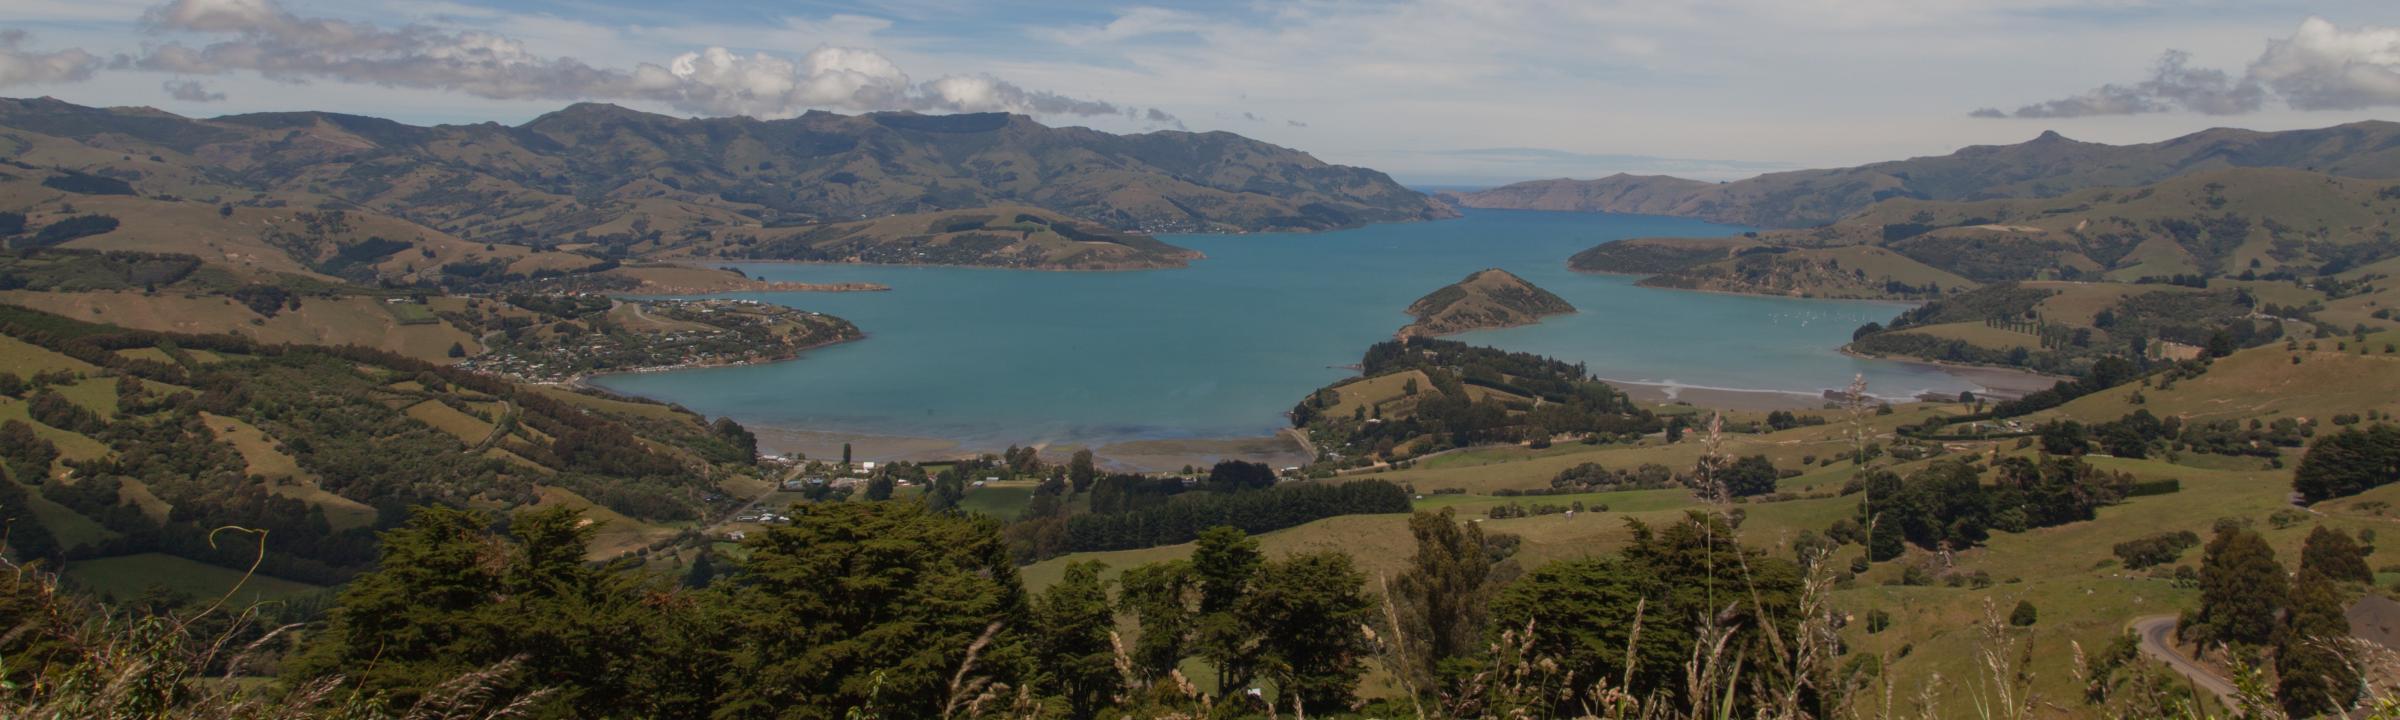 Akaroa – entspannt ankommen auf Neuseeland